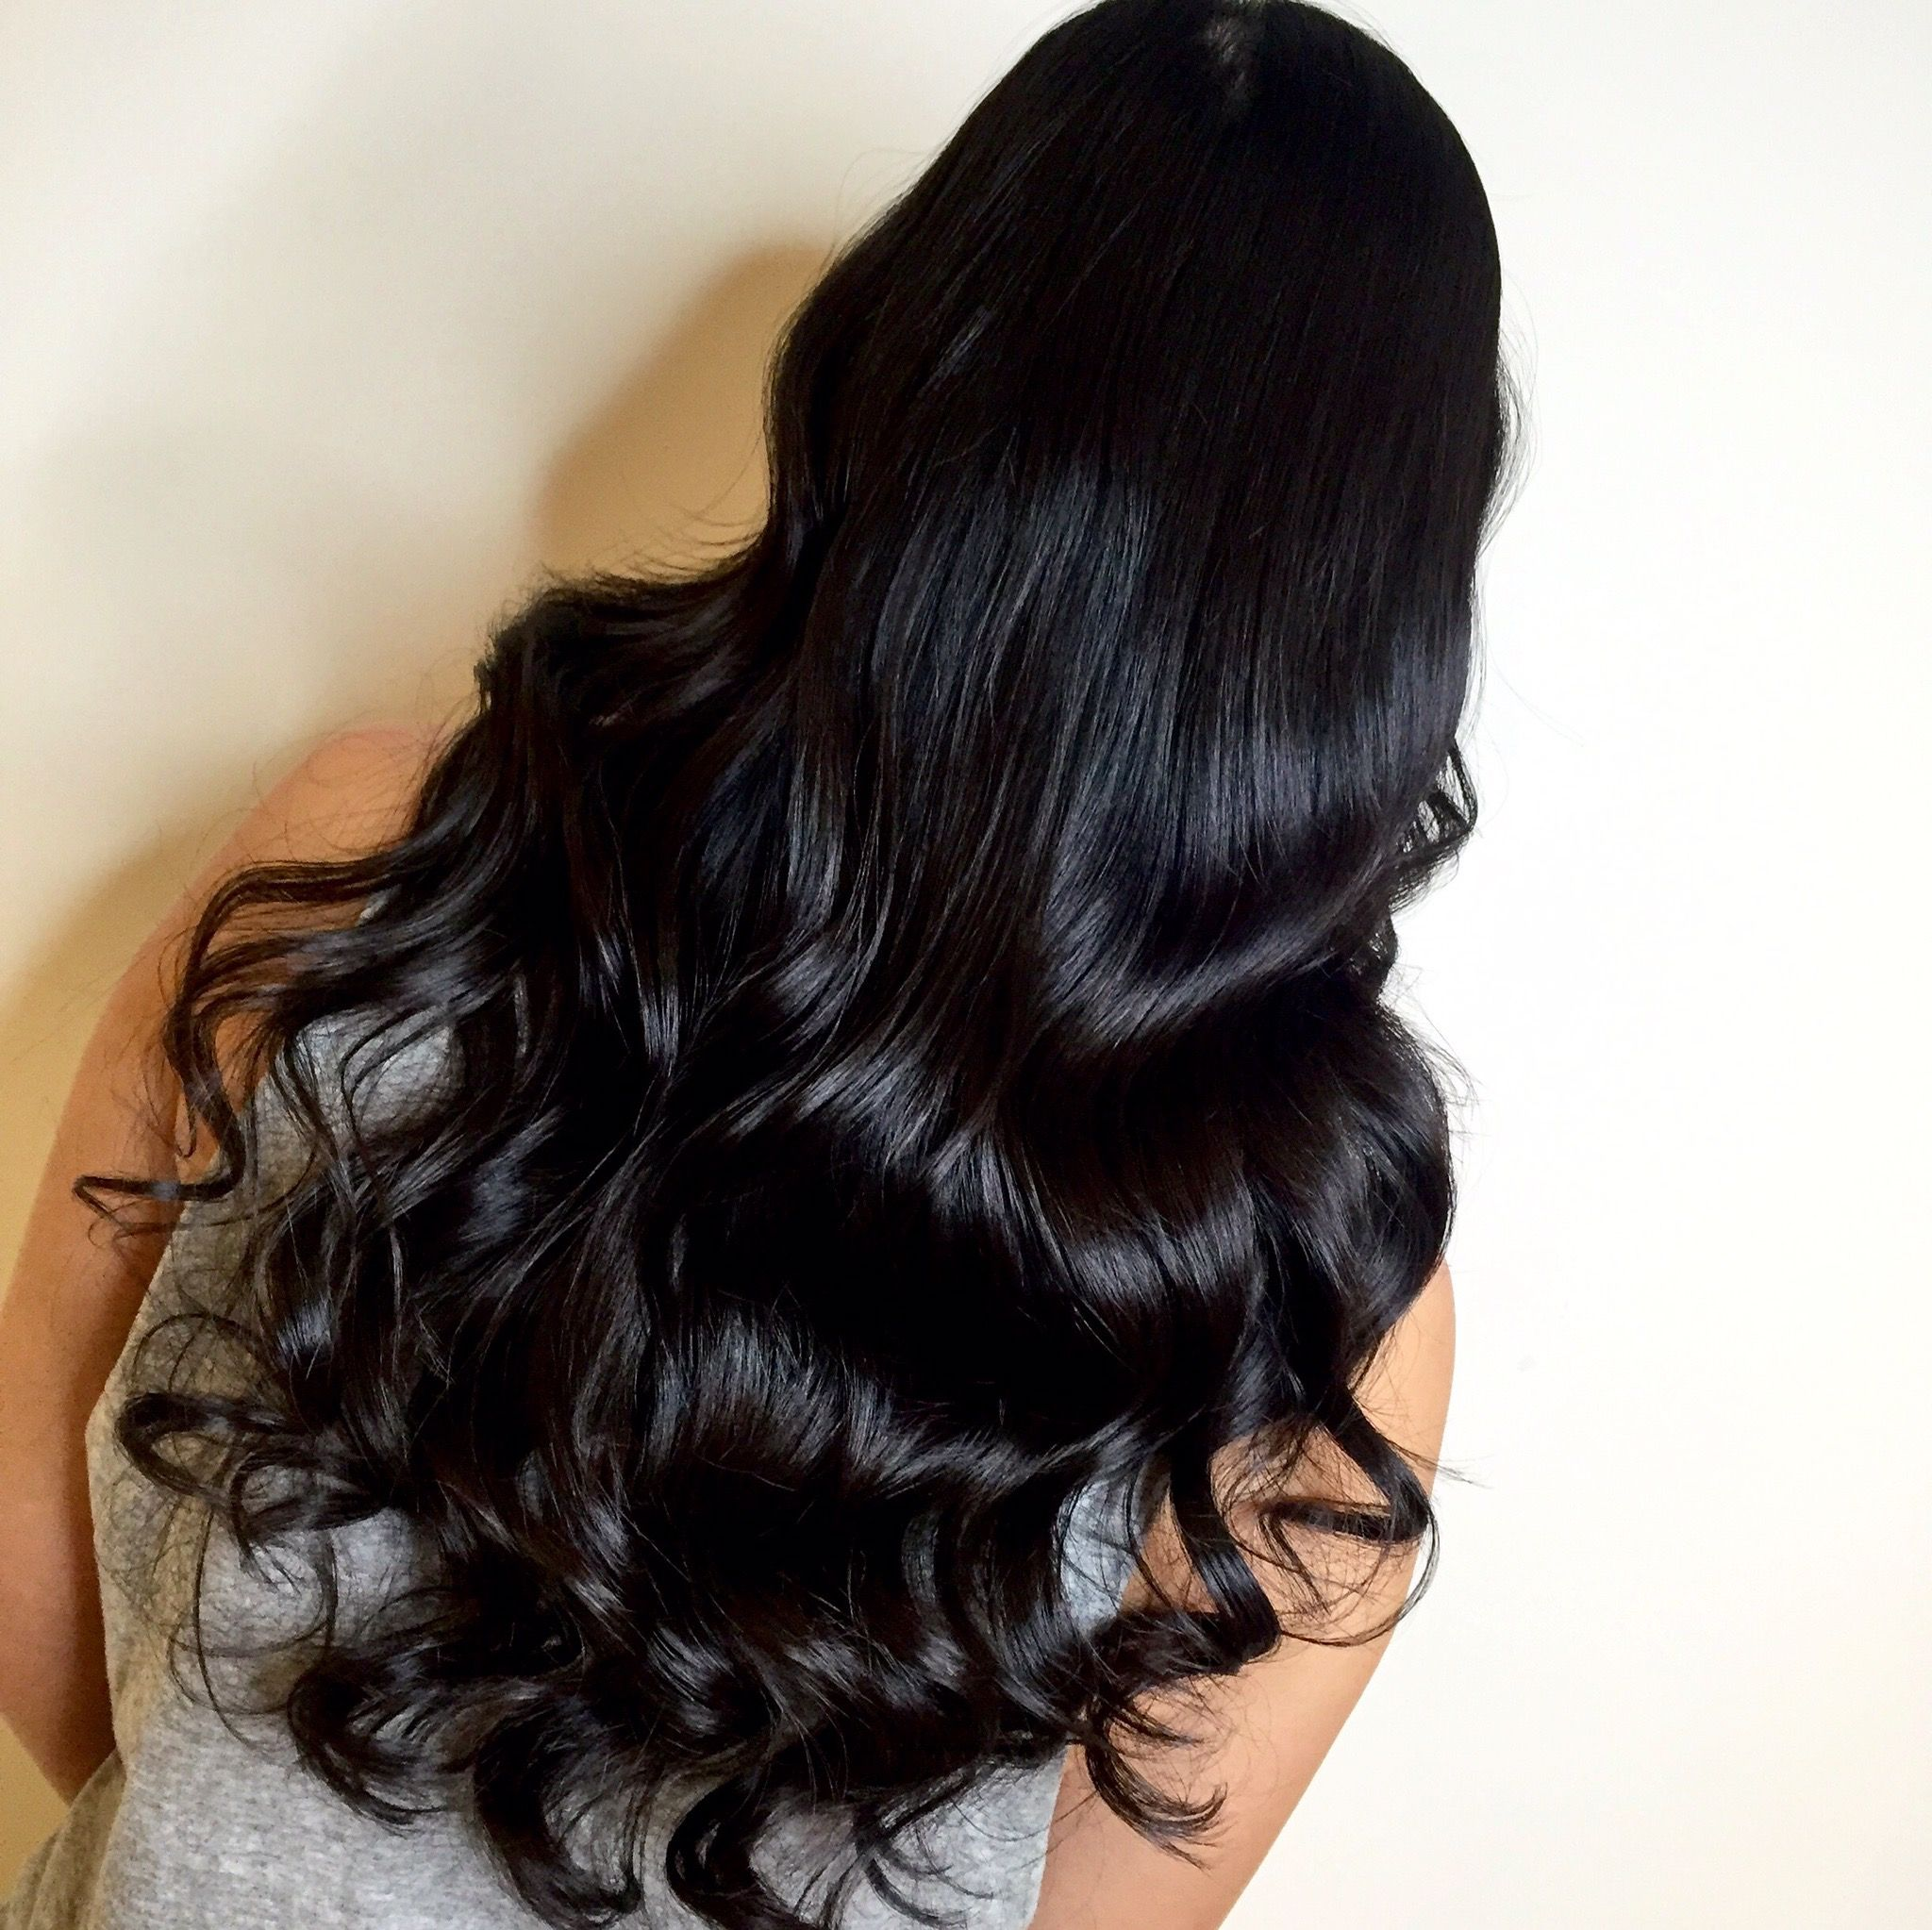 Long Layered Haircut And Glamorous Wave By Zoe Zoe Stylez